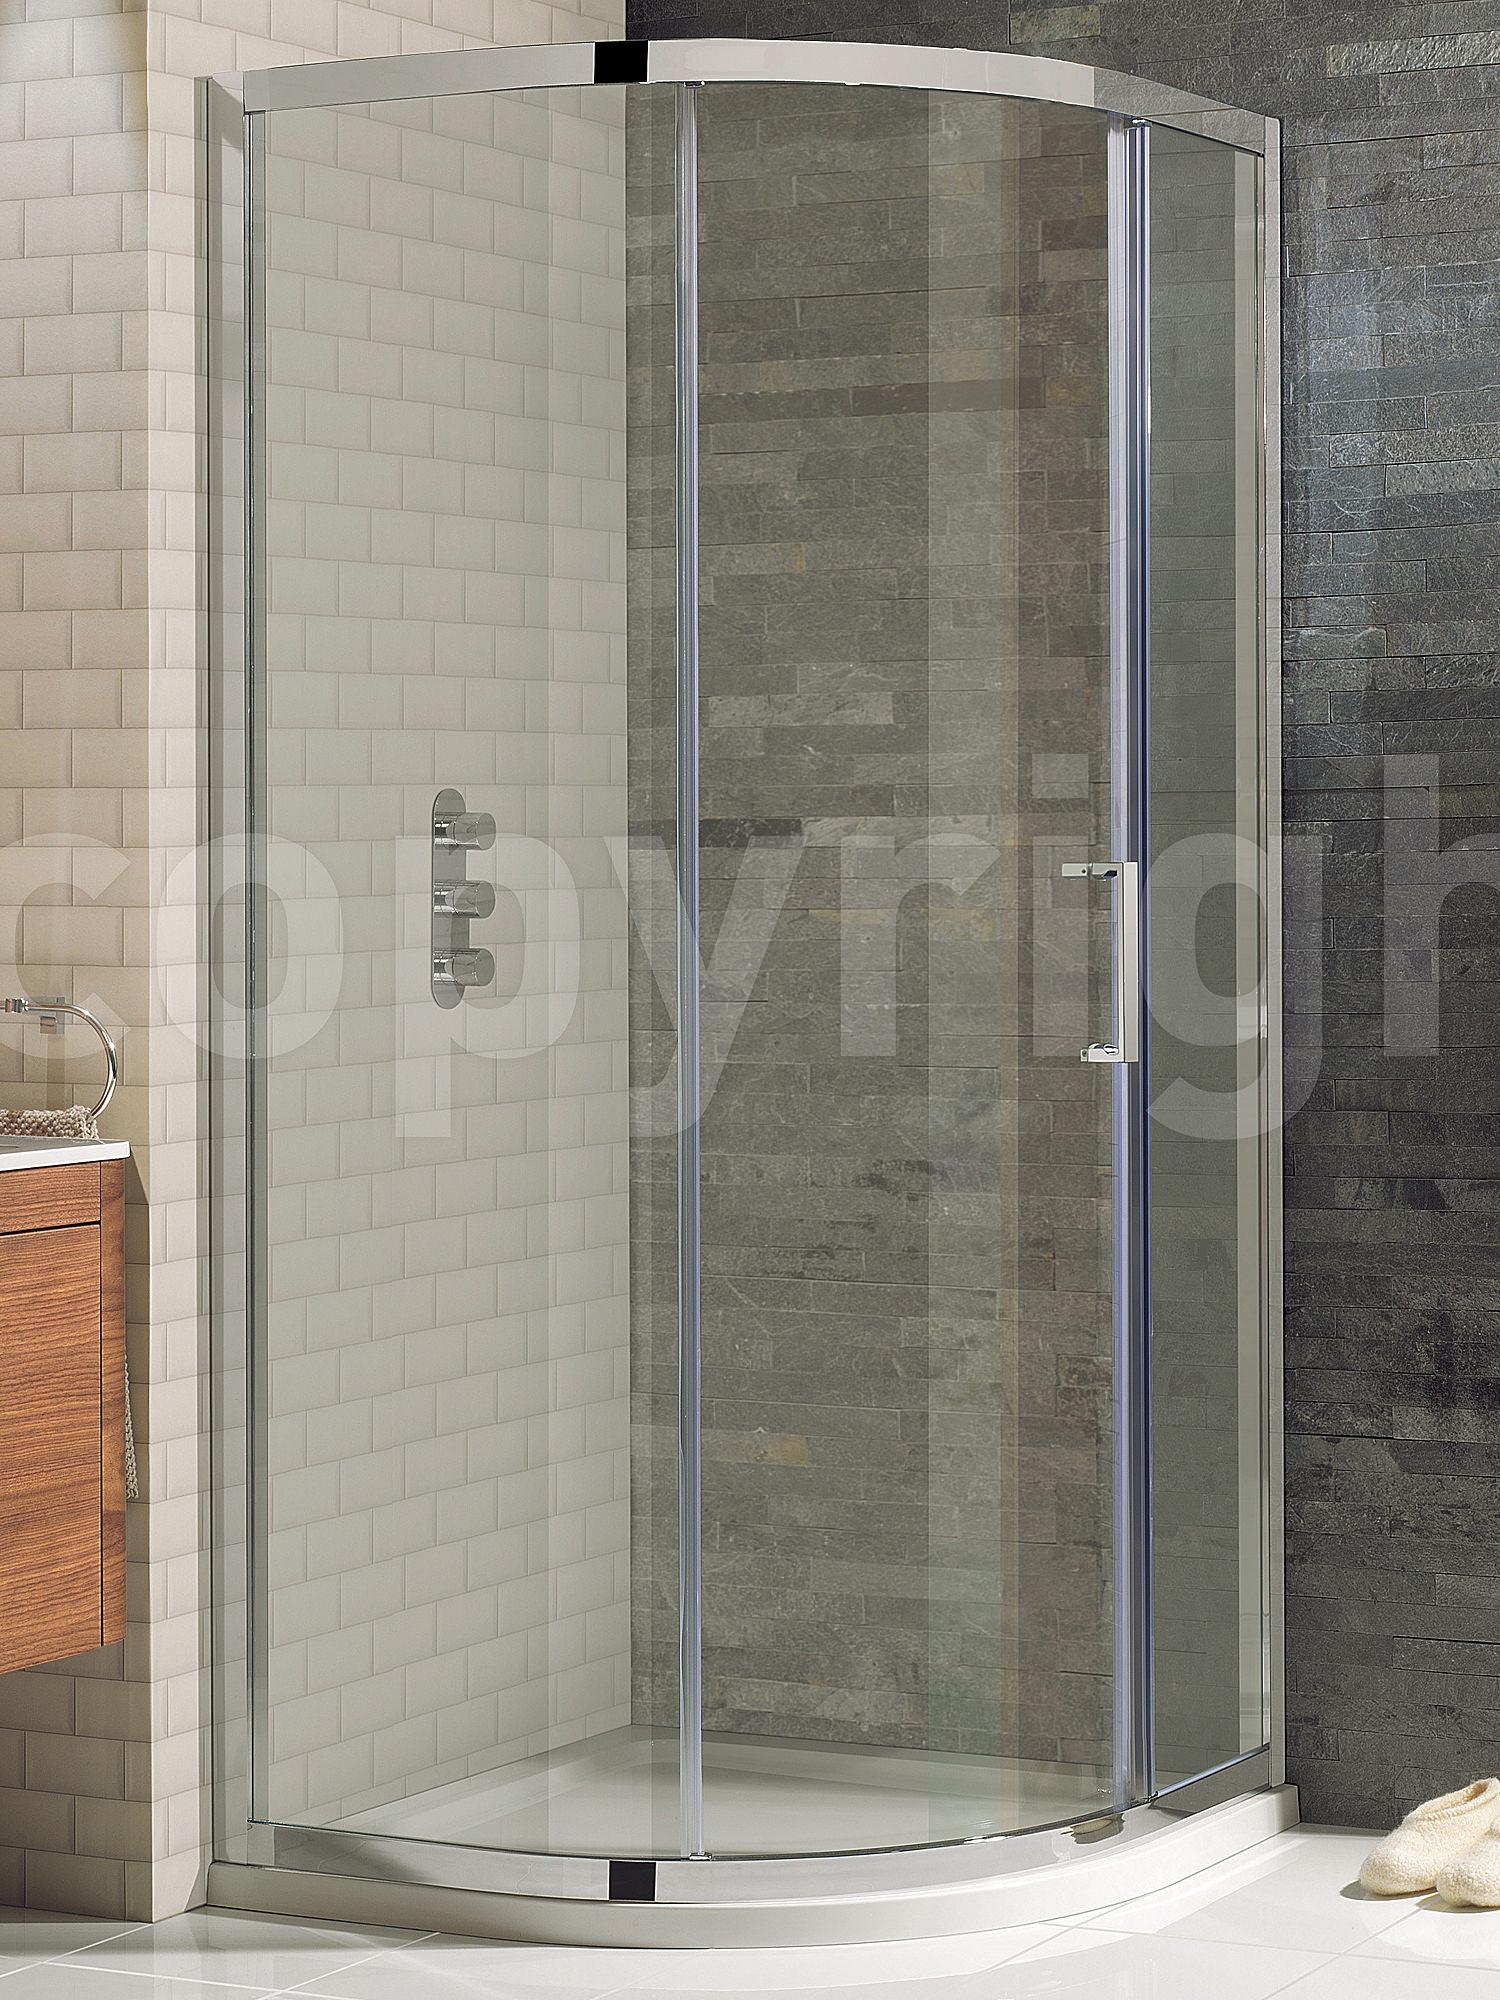 Simpsons Elite Offset Quadrant Single Door 1000 x 800mm & Simpsons Elite Shower Enclosures - Mirrored Hinged Doors